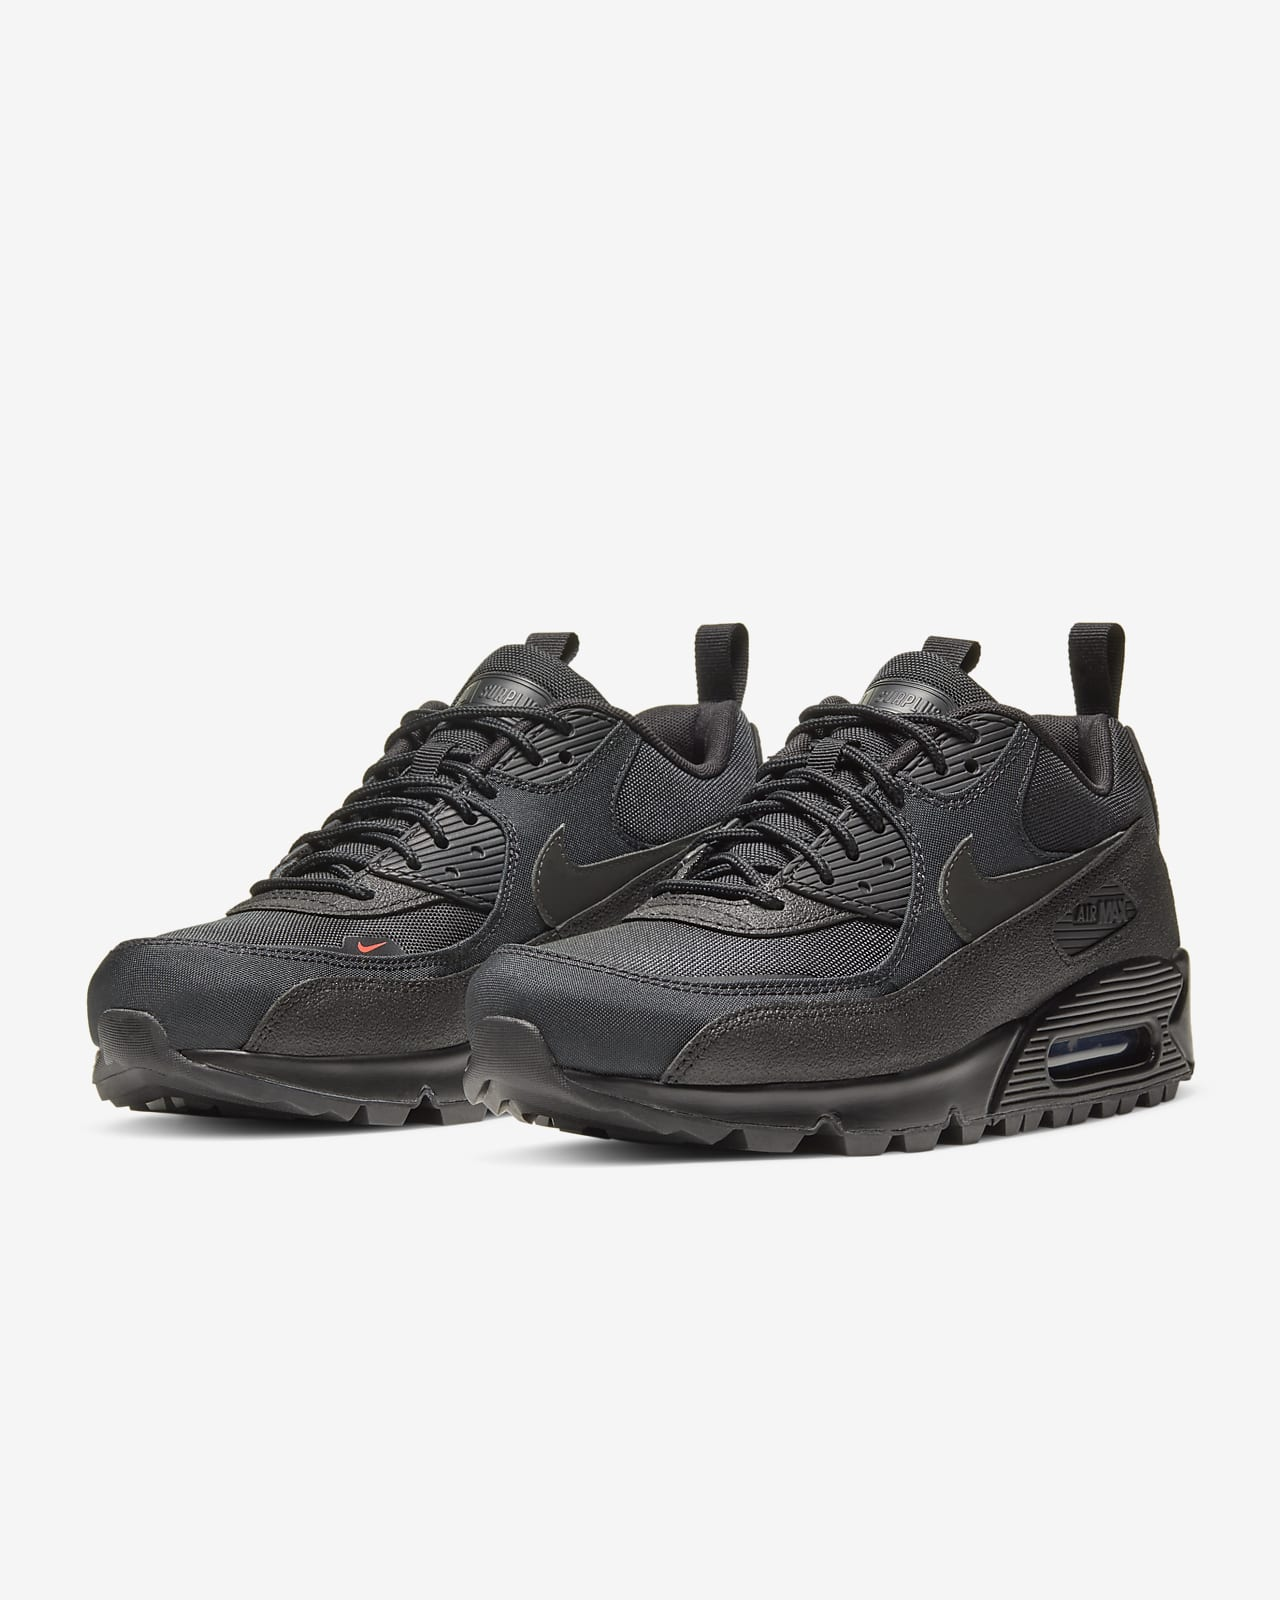 Chaussure Nike Air Max 90 Surplus pour Homme